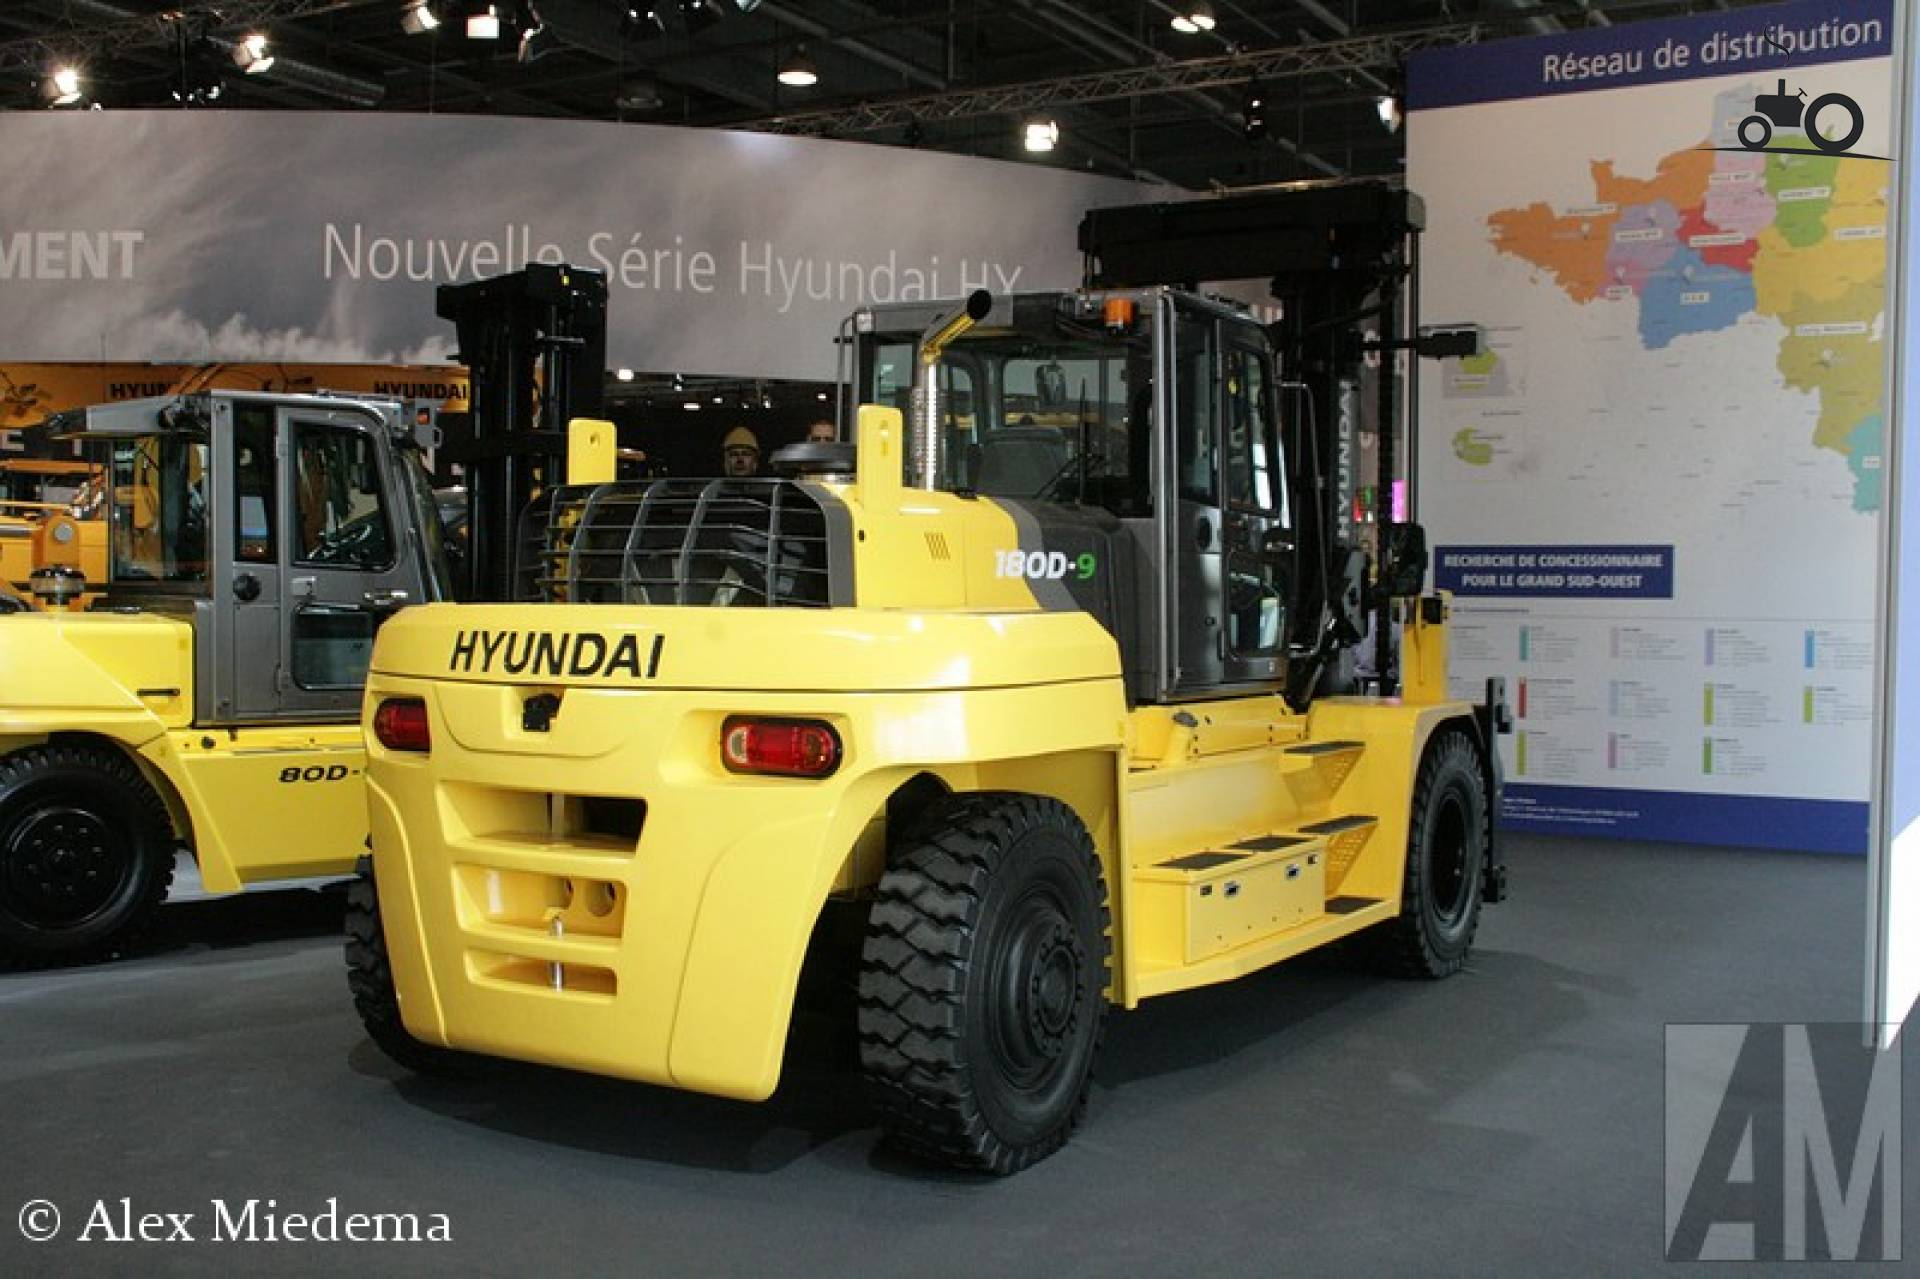 Hyundai 180D-9